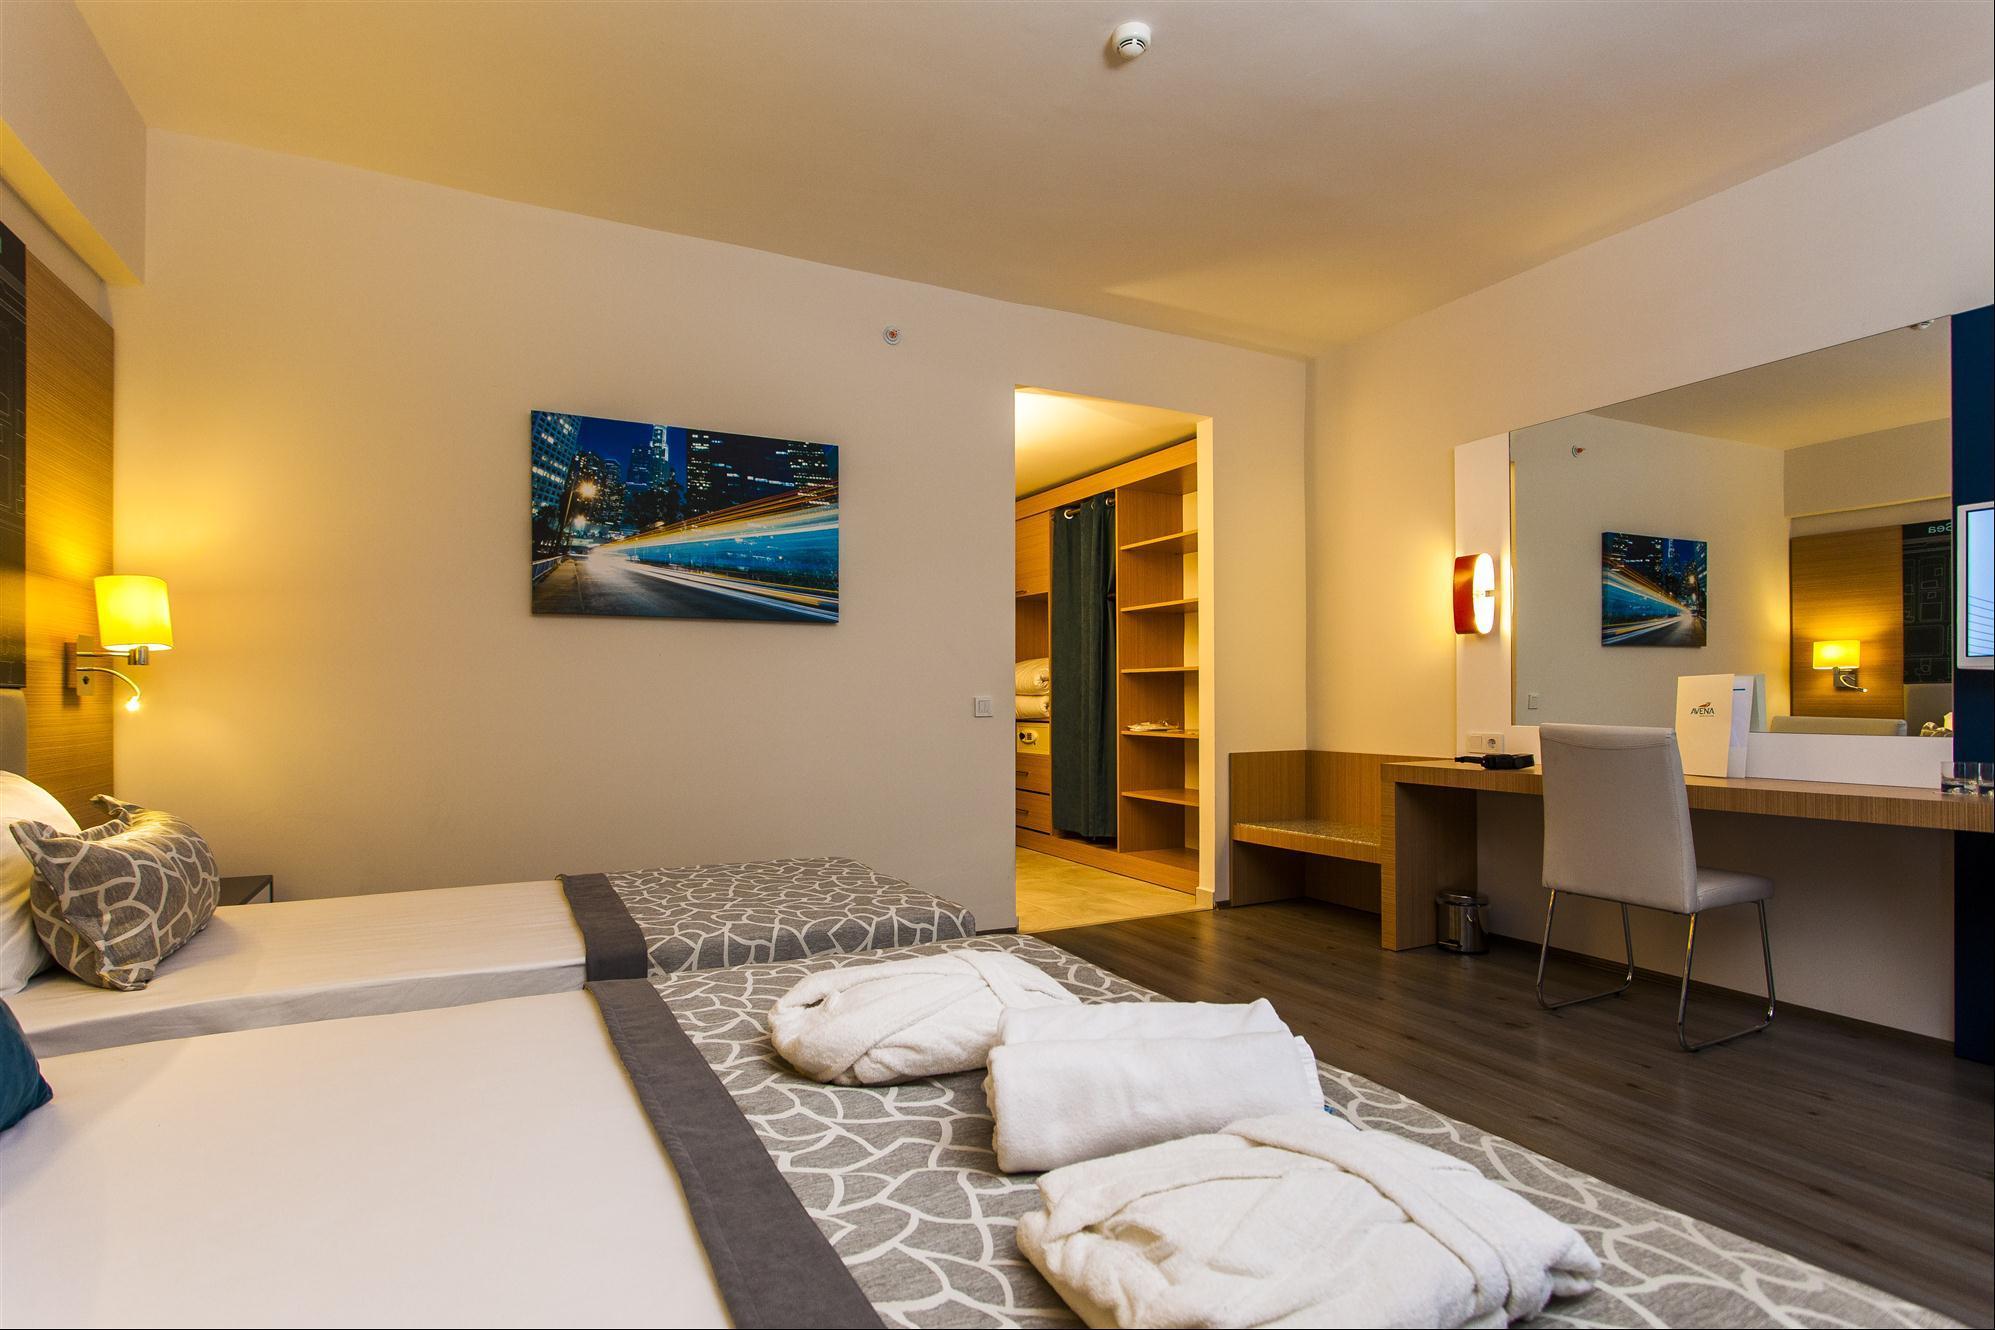 avena-resort-spa-hotel-ex-gold-safran-hotel-genel-003